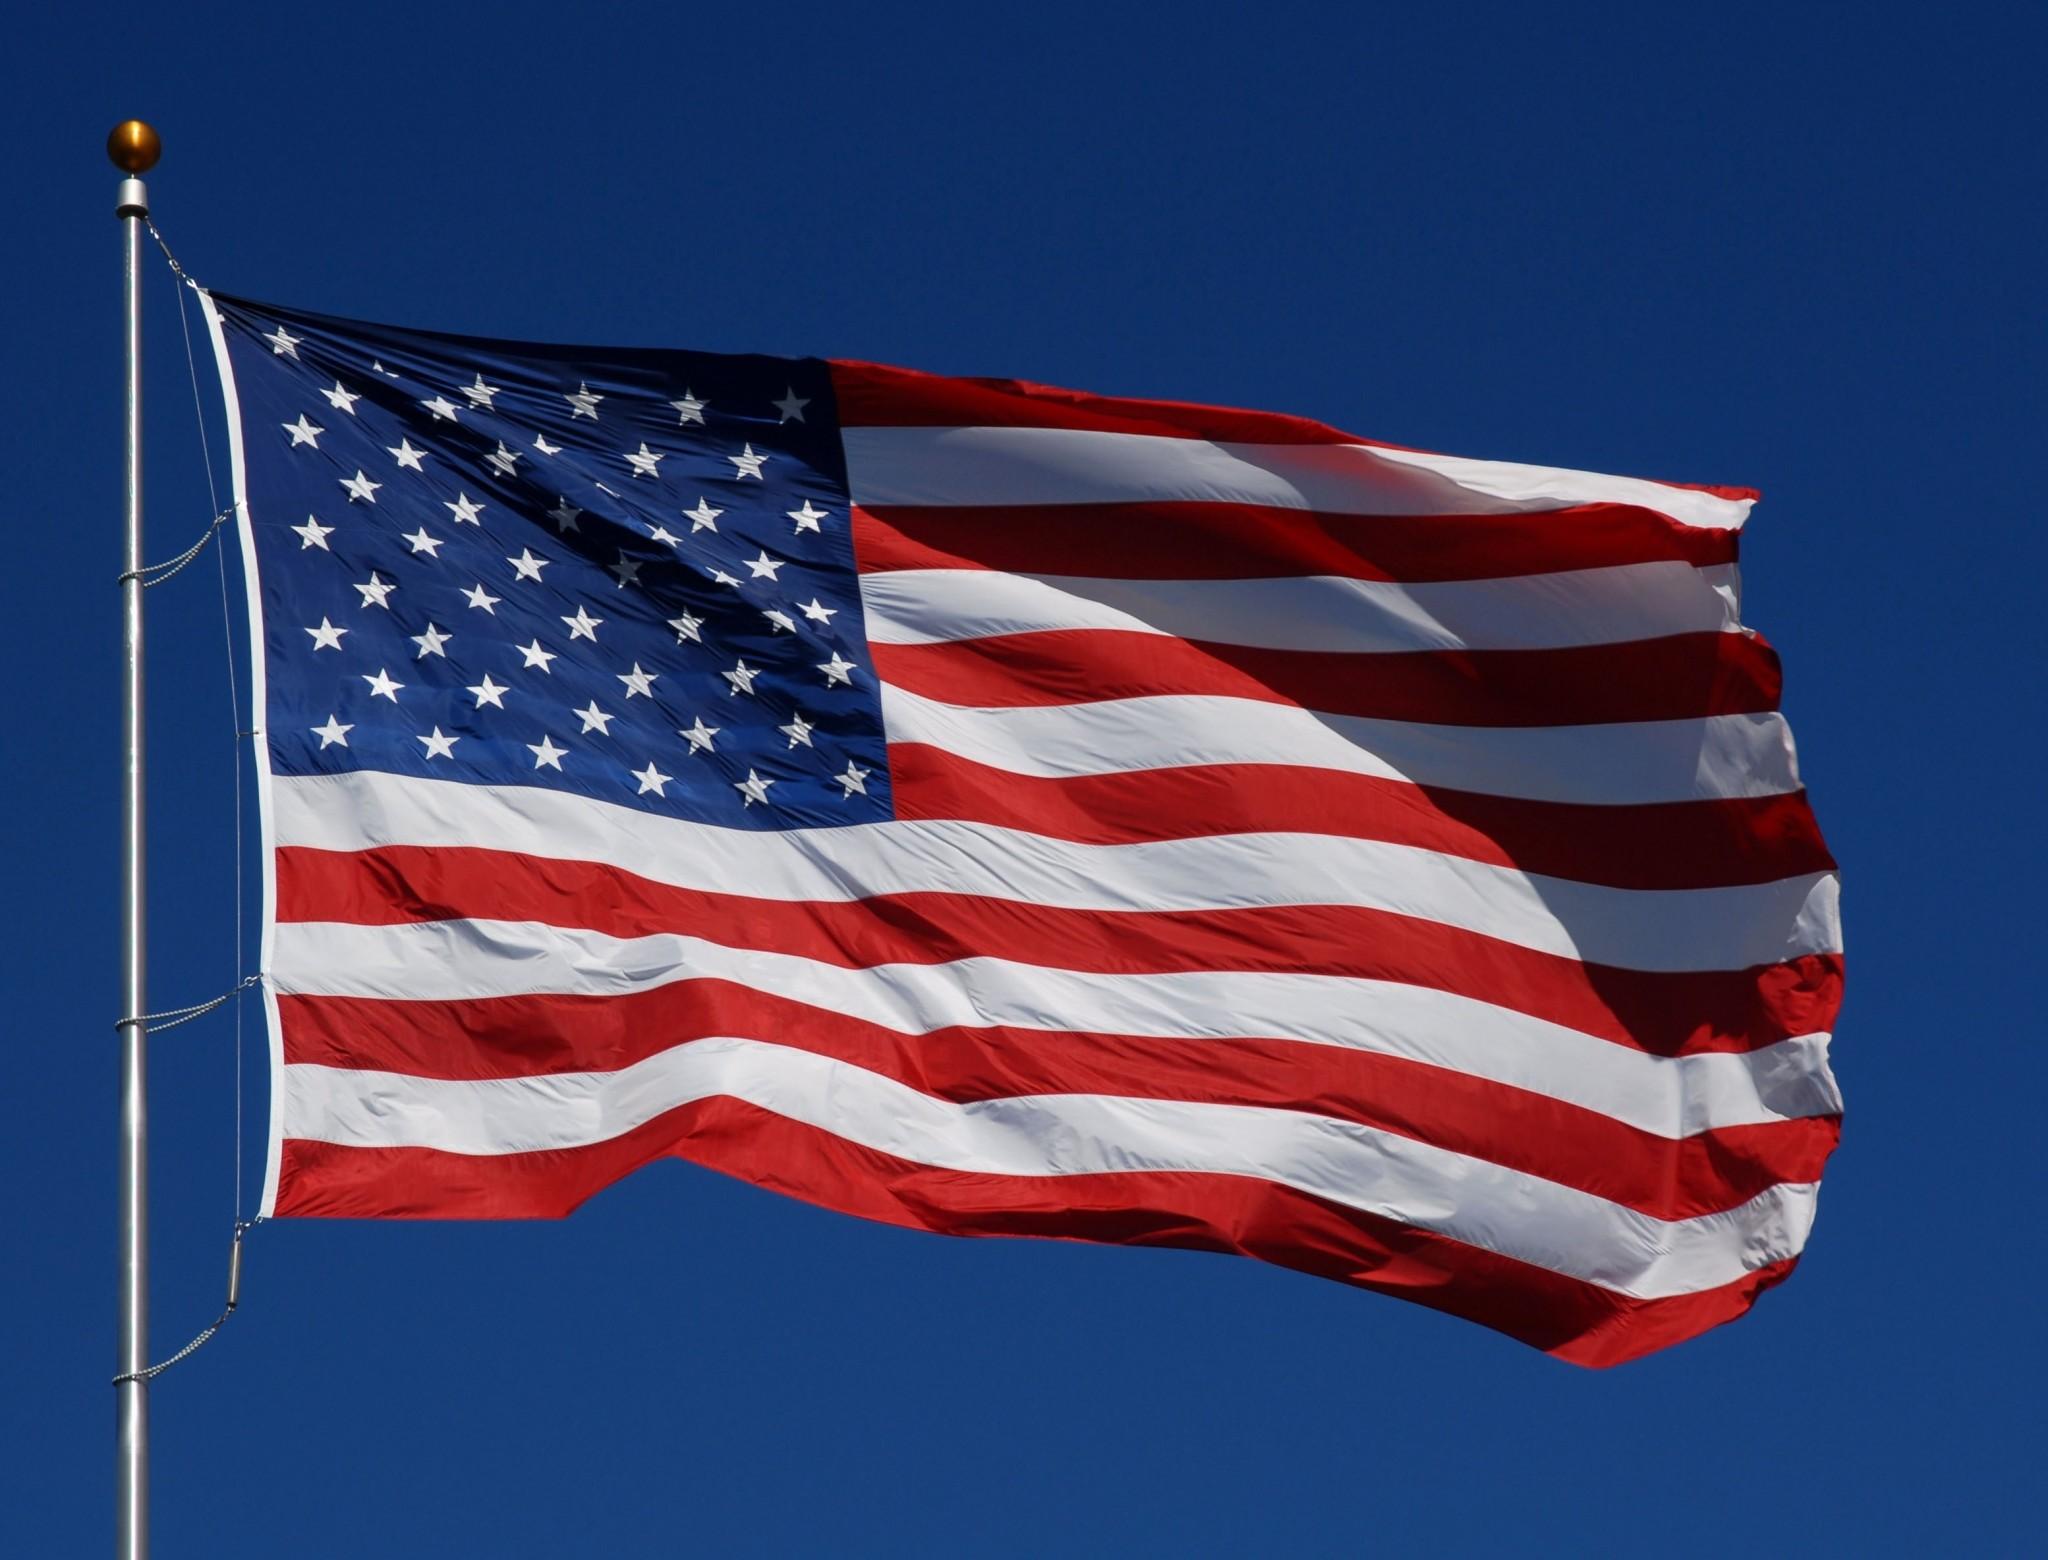 confederate flag wallpaper backgrounds hd